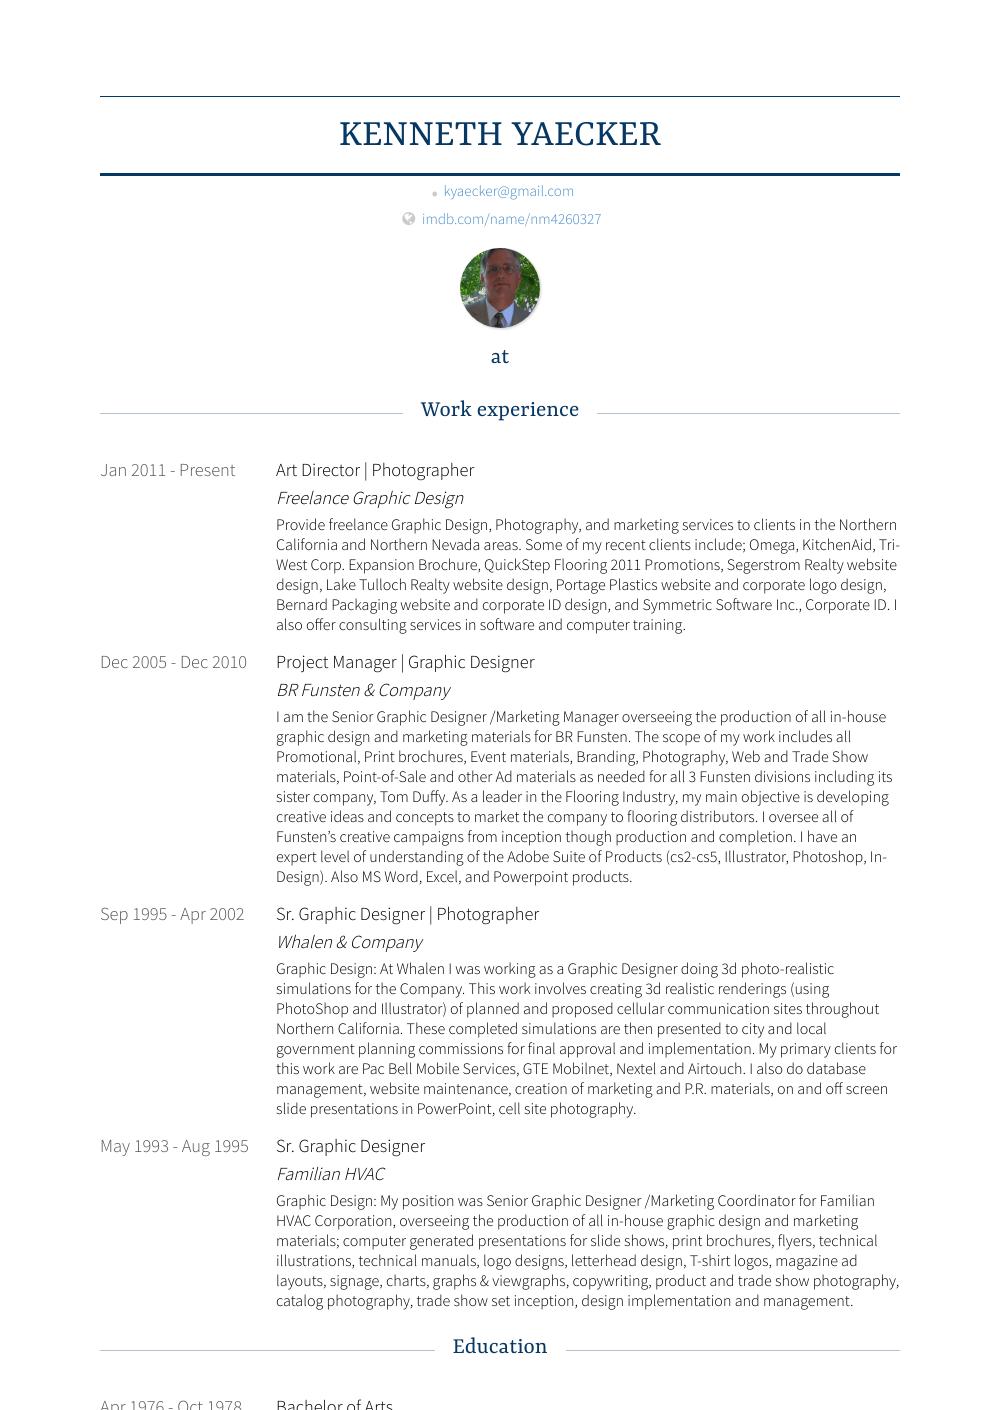 Art Director - Resume Samples & Templates | VisualCV